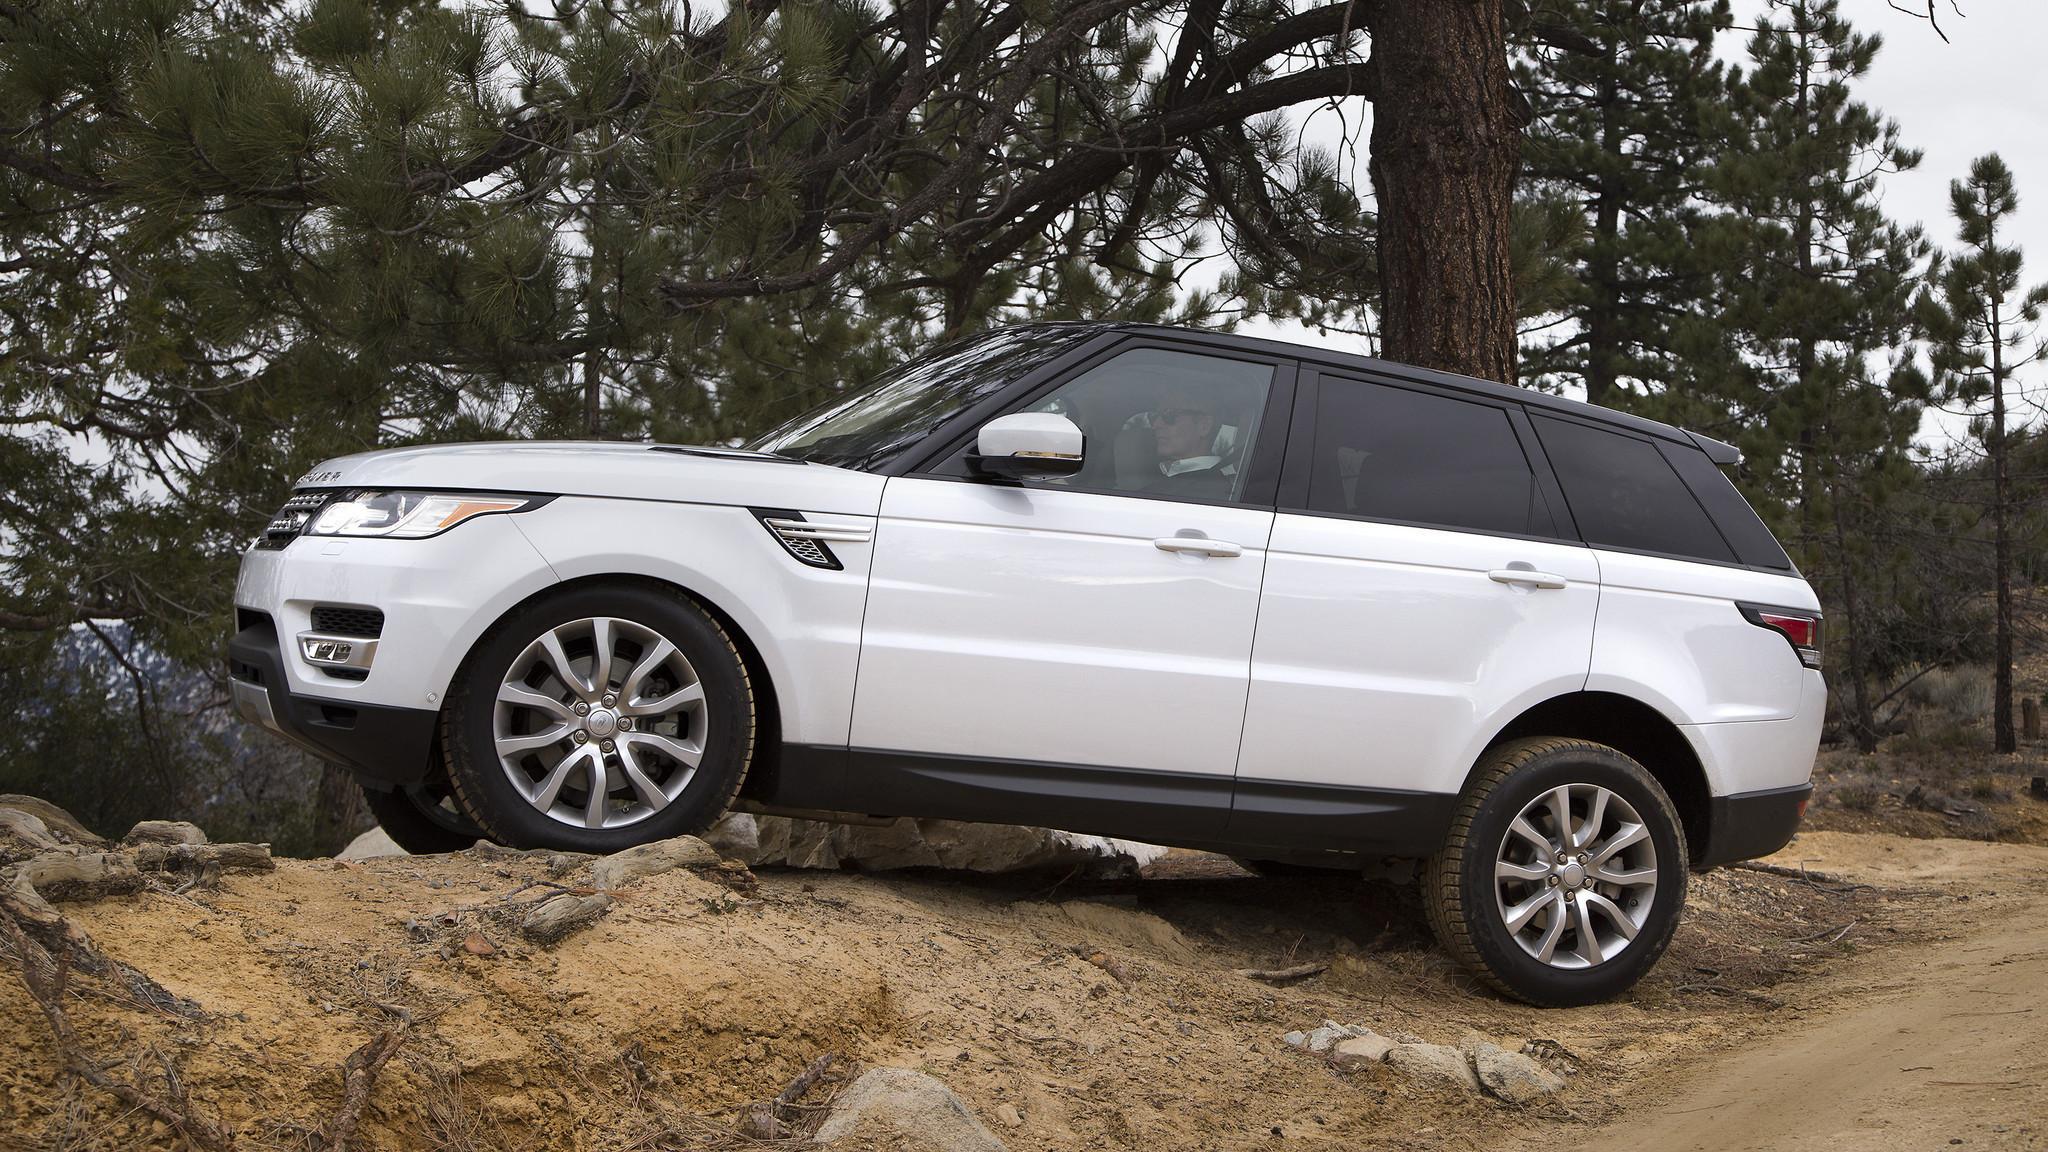 Range Rover Sport HSE Td6 review A posh drive through El Ni±o s